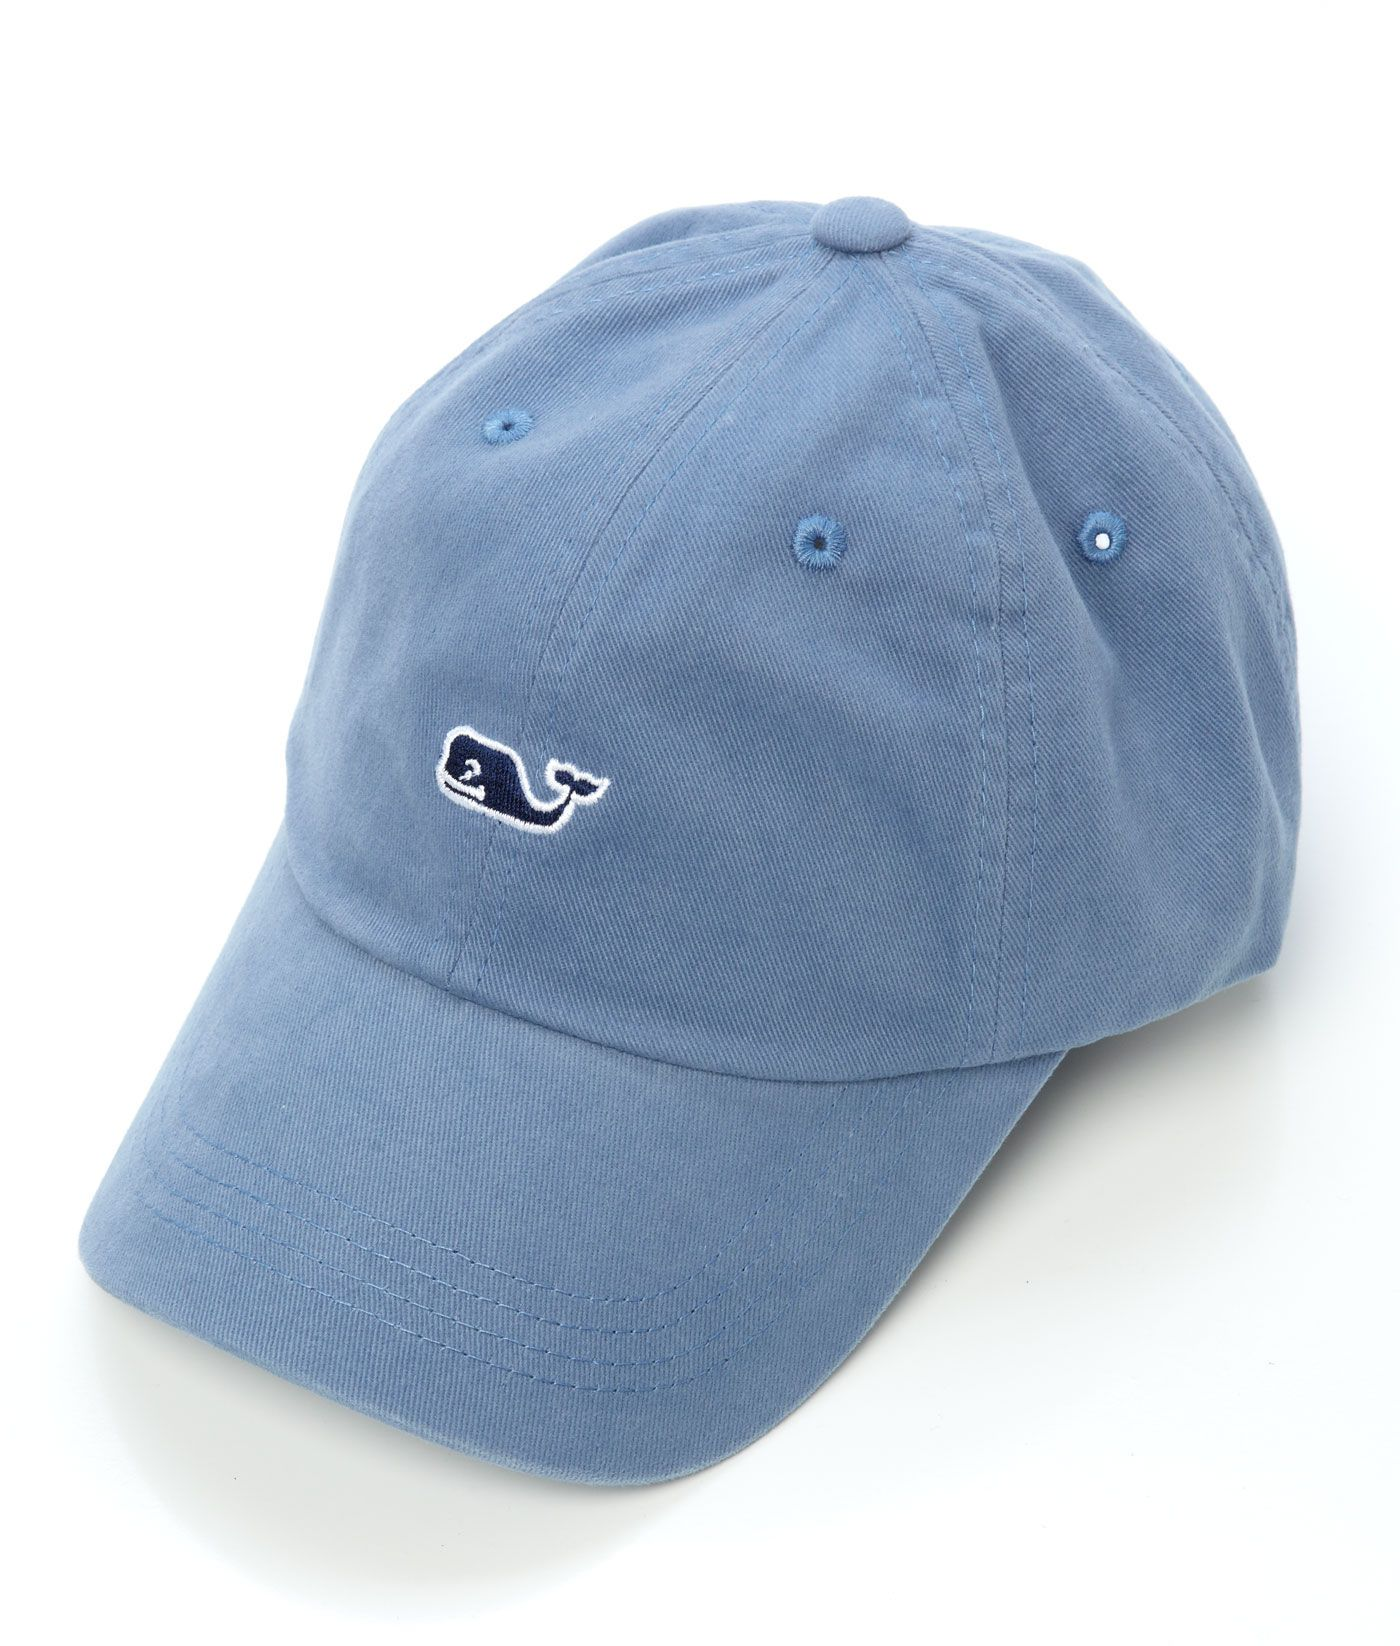 2d672894a30 AQUA BLUE............Shop Signature Whale Logo Baseball Hat at vineyard  vines